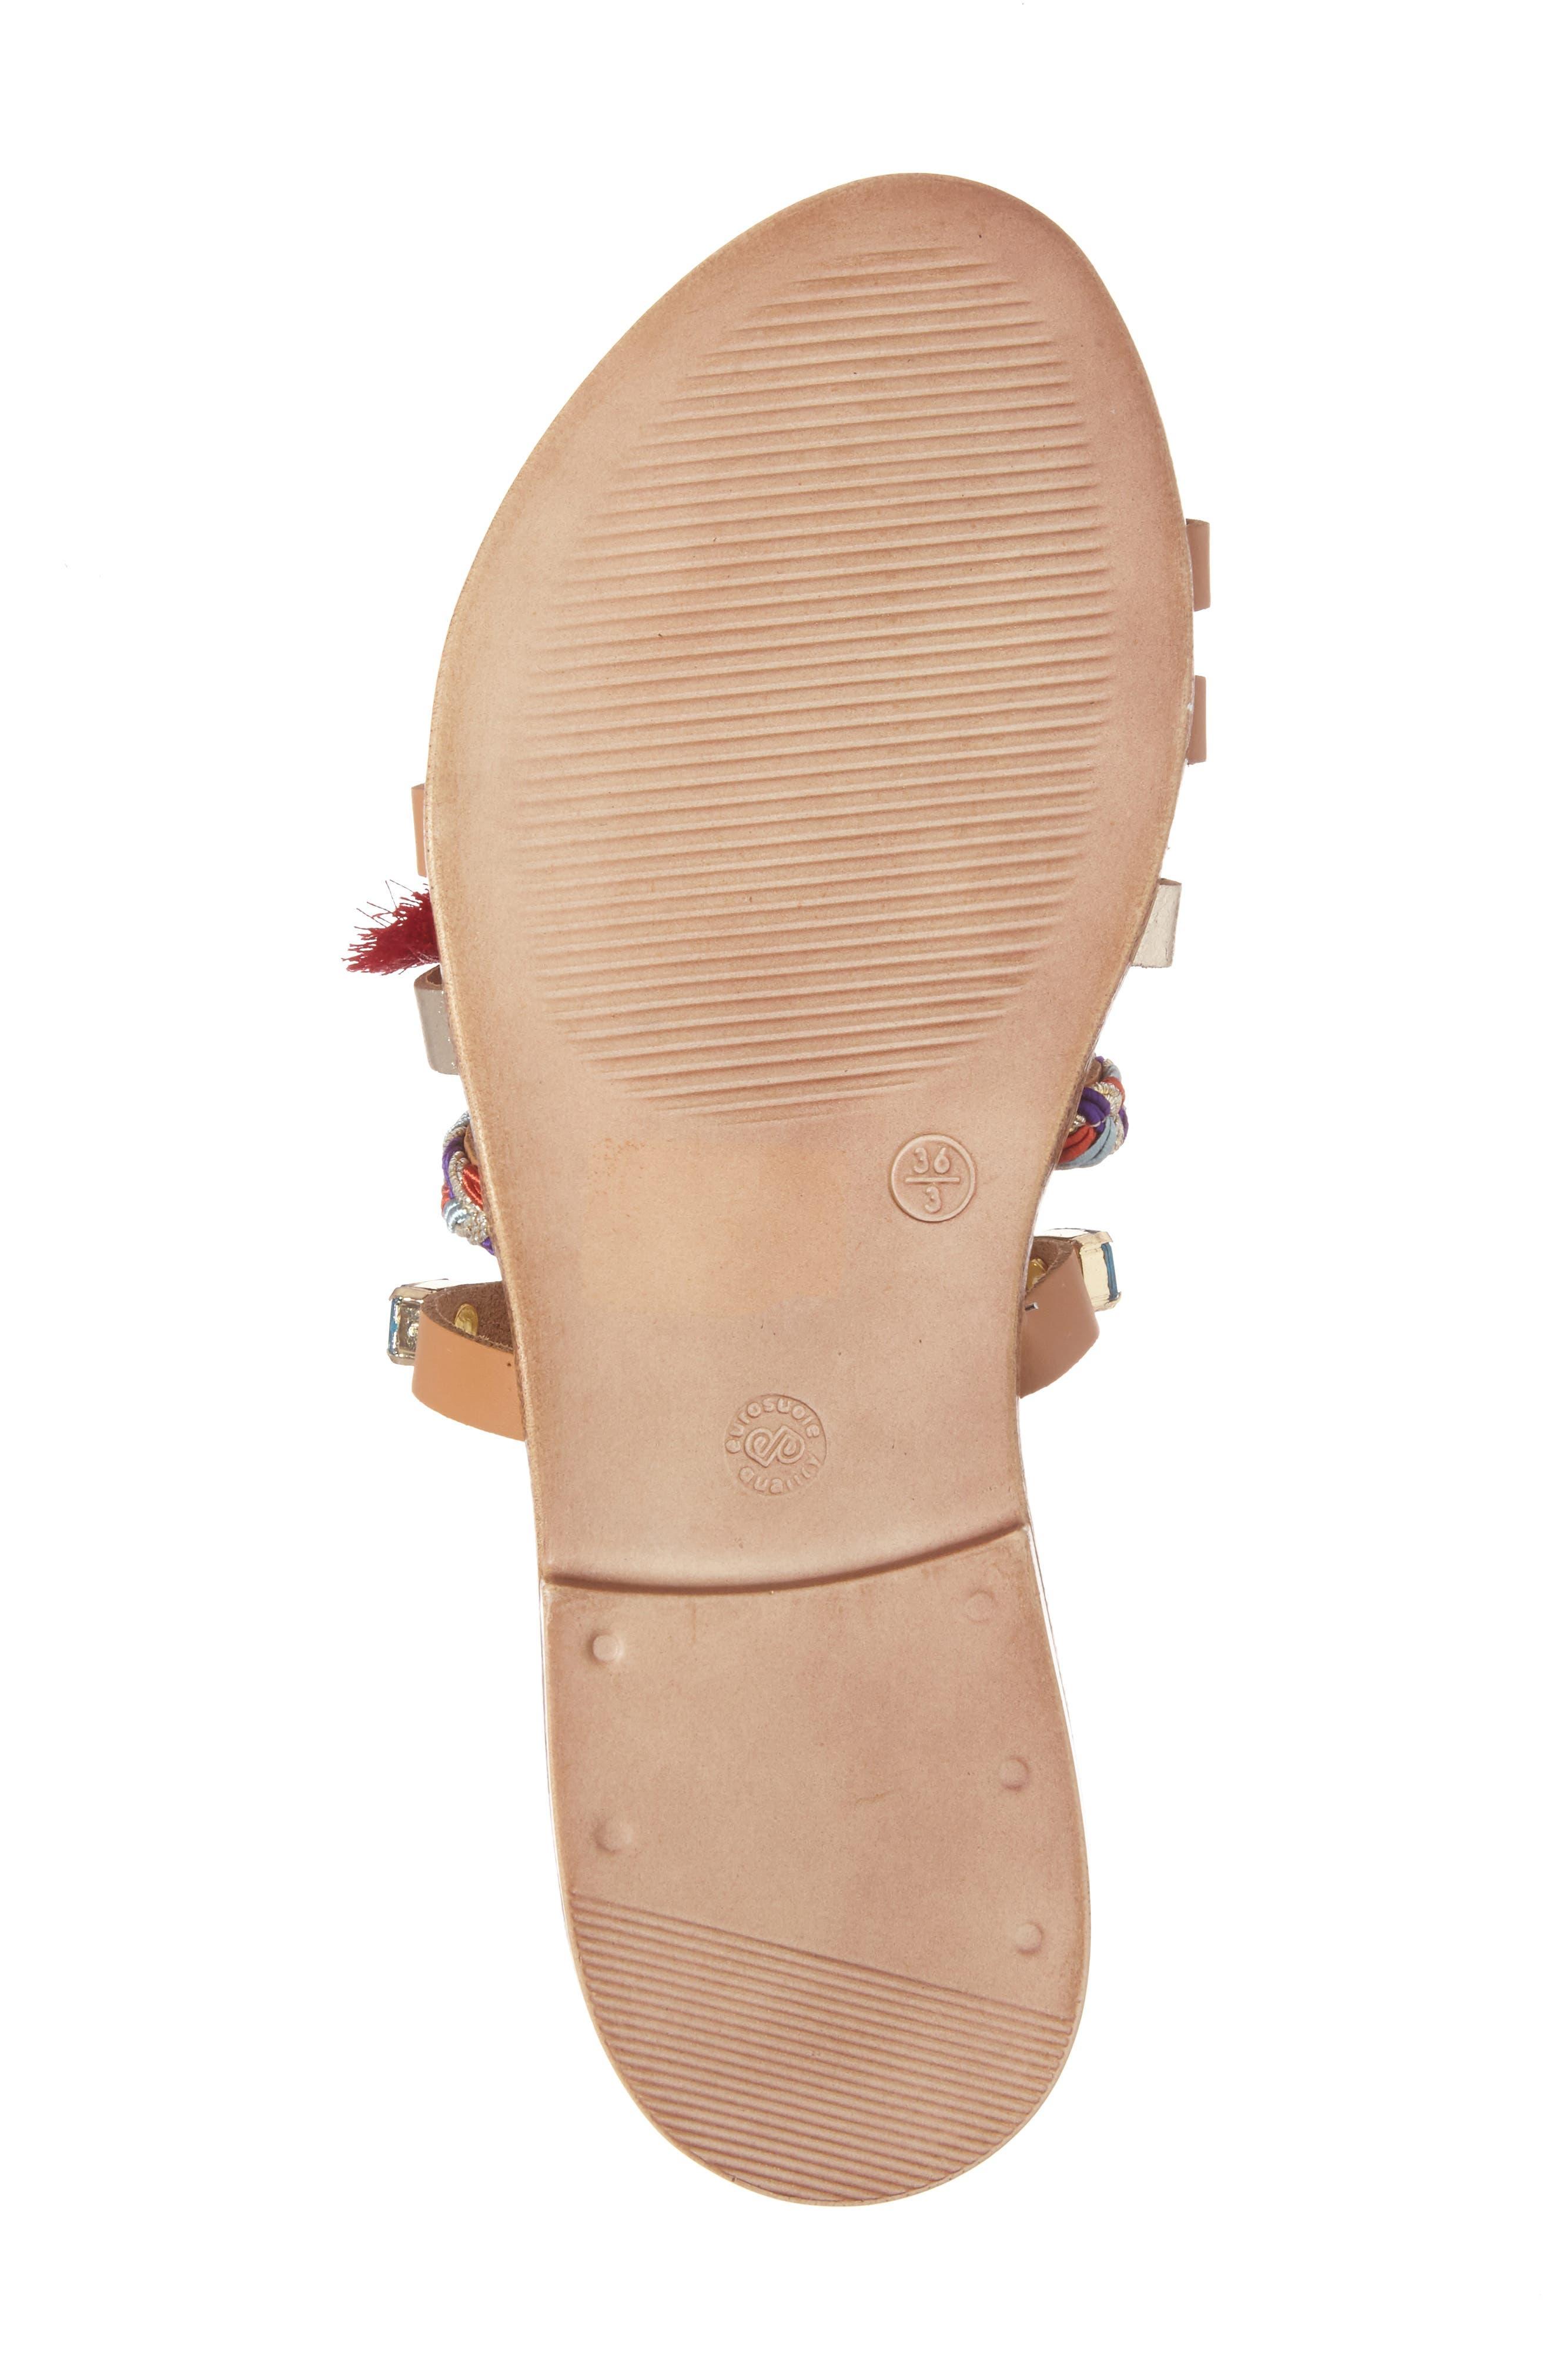 Cary Embellished Sandal,                             Alternate thumbnail 6, color,                             200